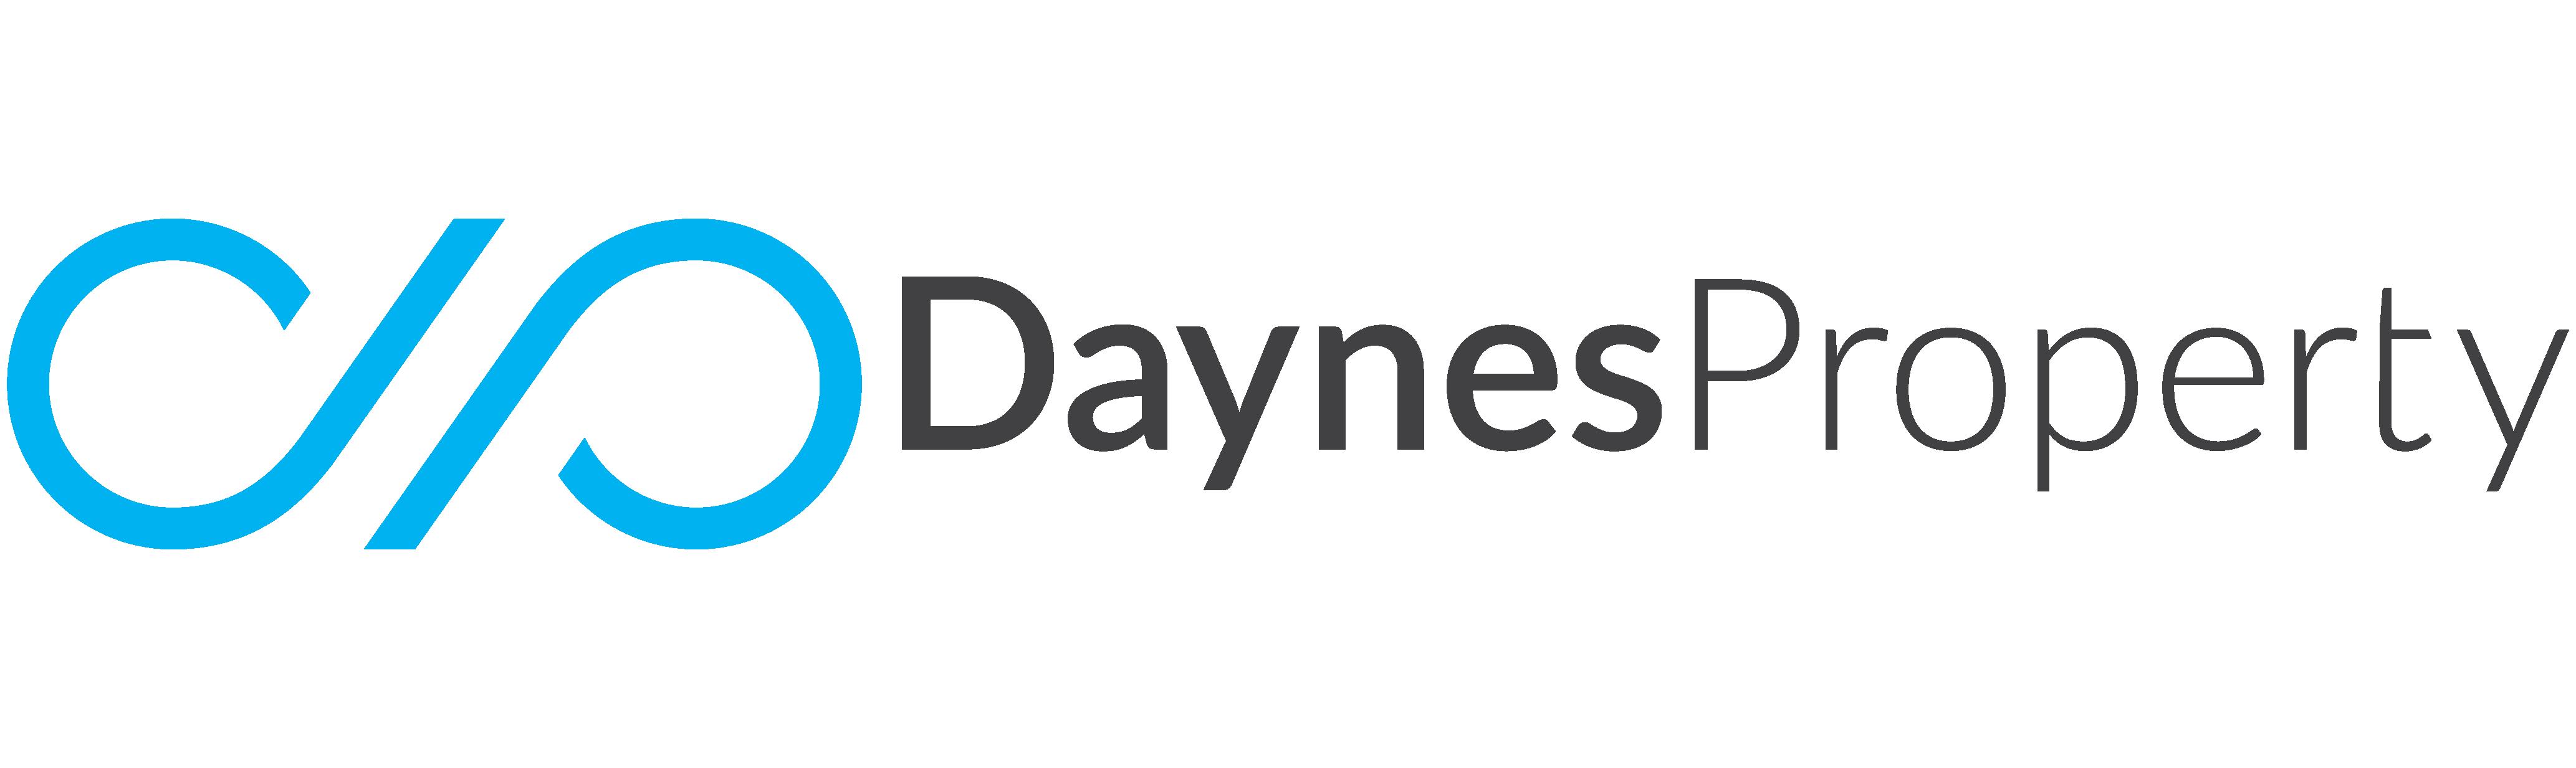 www.daynesproperty.com